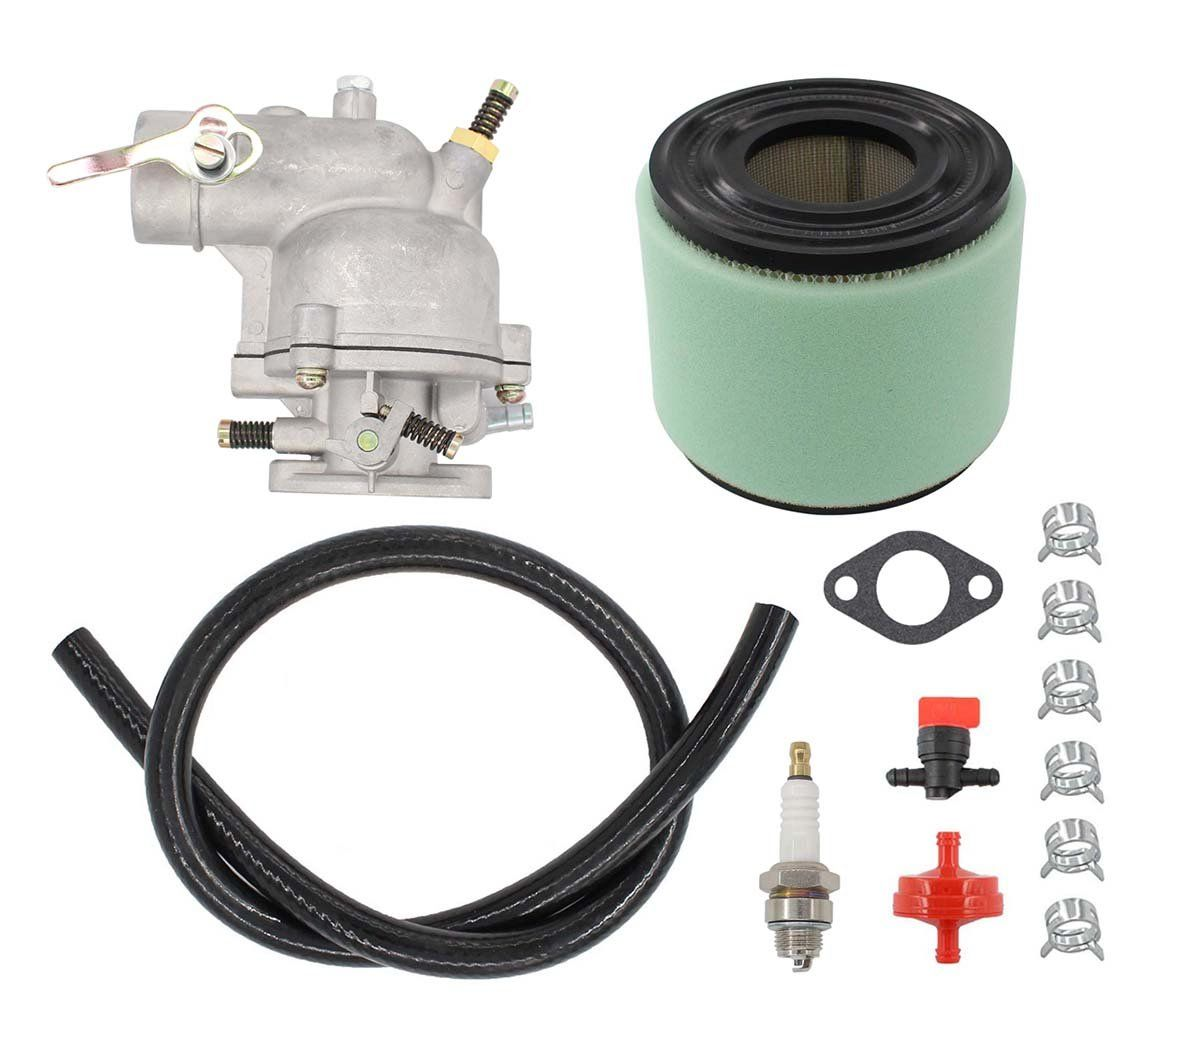 carburetor air filter fuel hose shut off valve for briggs and stratton 390323 394228 299169 7 [ 1200 x 1051 Pixel ]